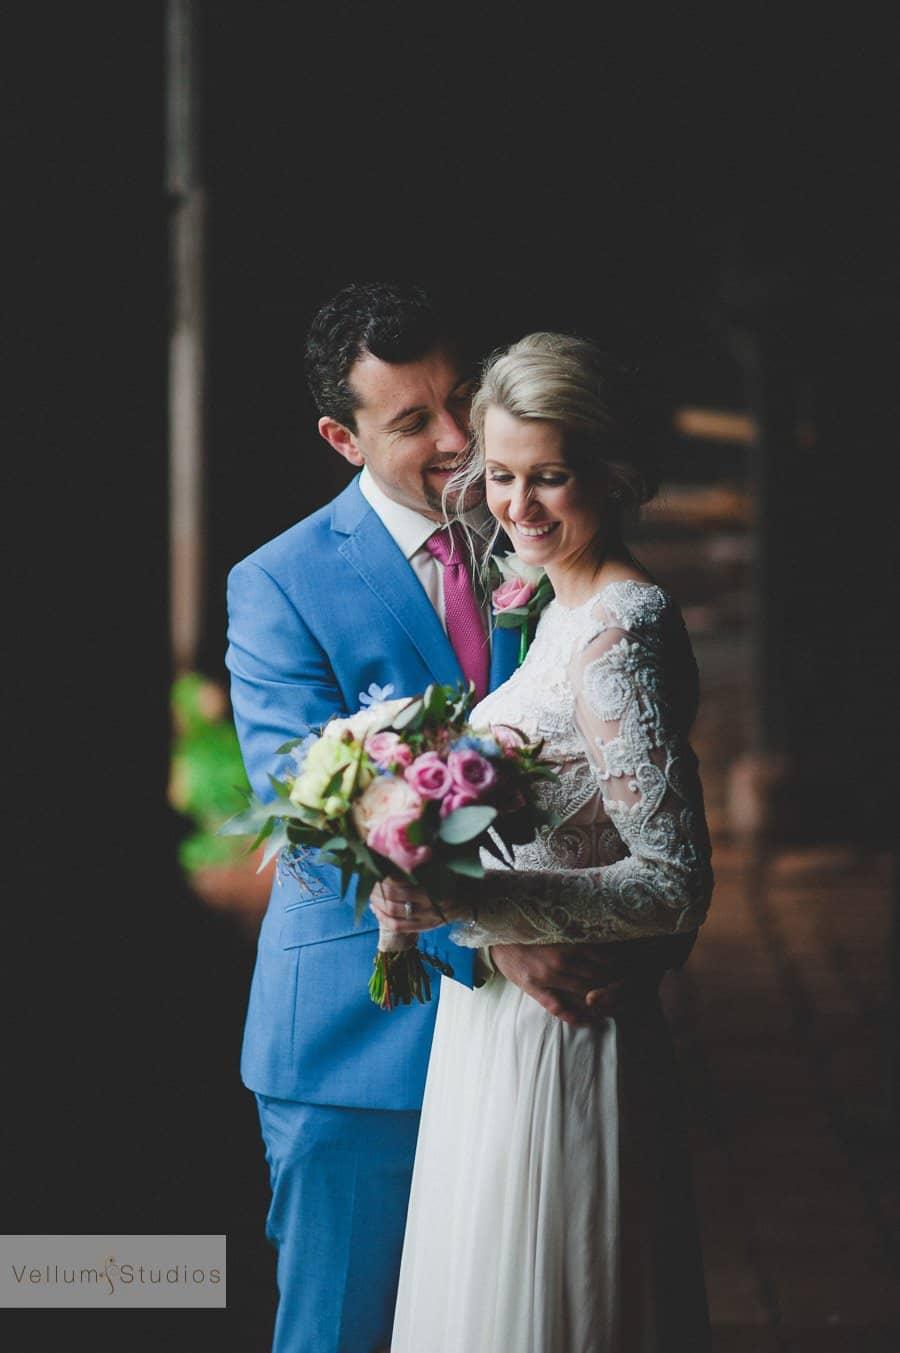 Wedding Photography Brisbane - moment